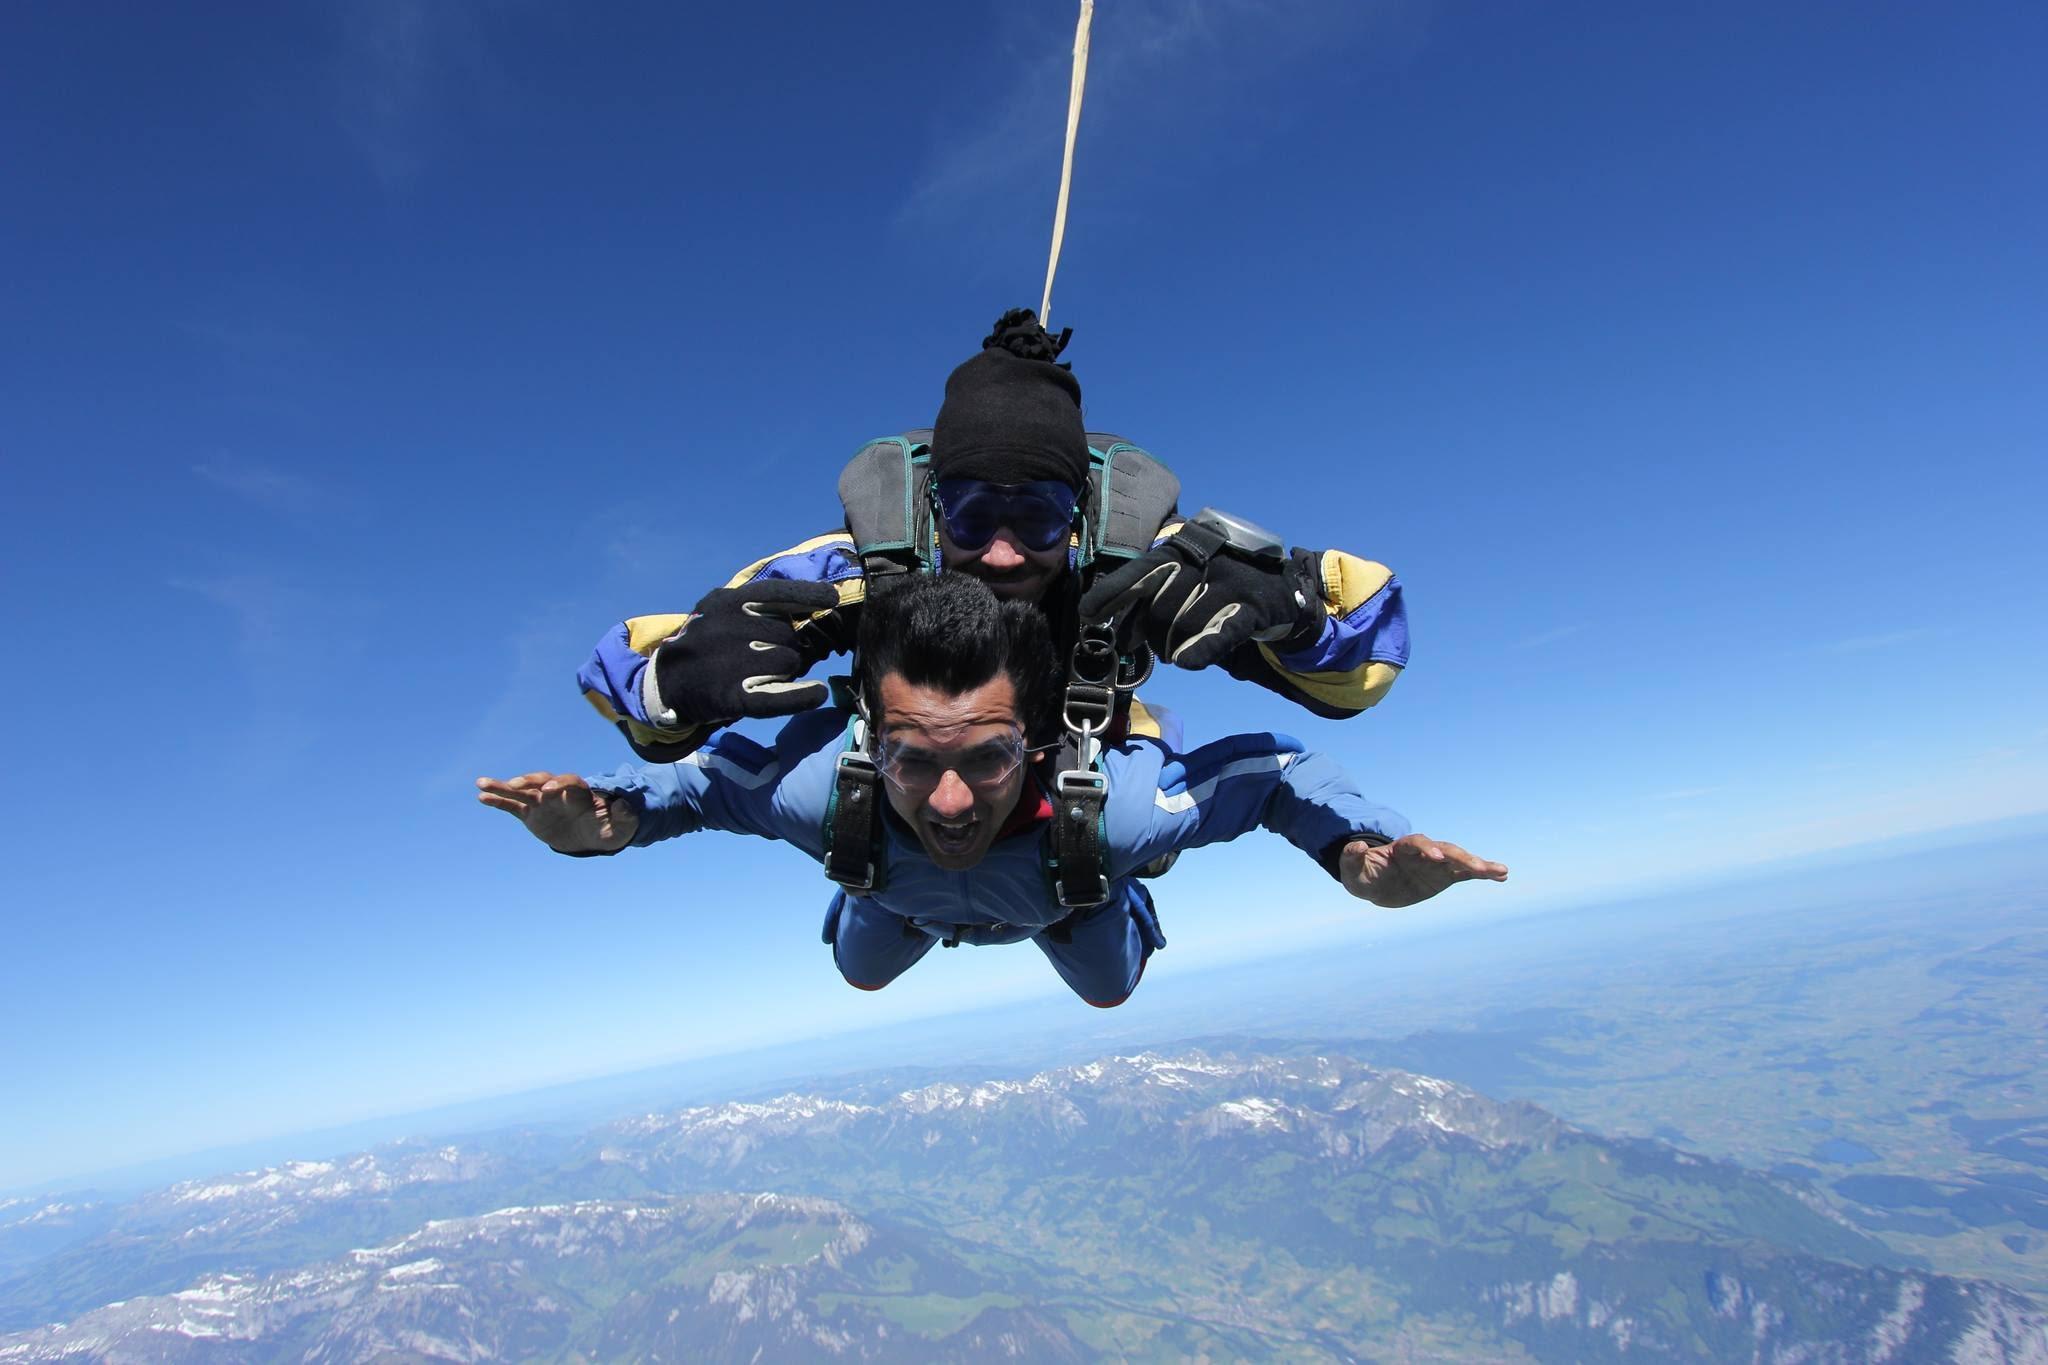 Interlaken, Switzerland skydiving - skydiving